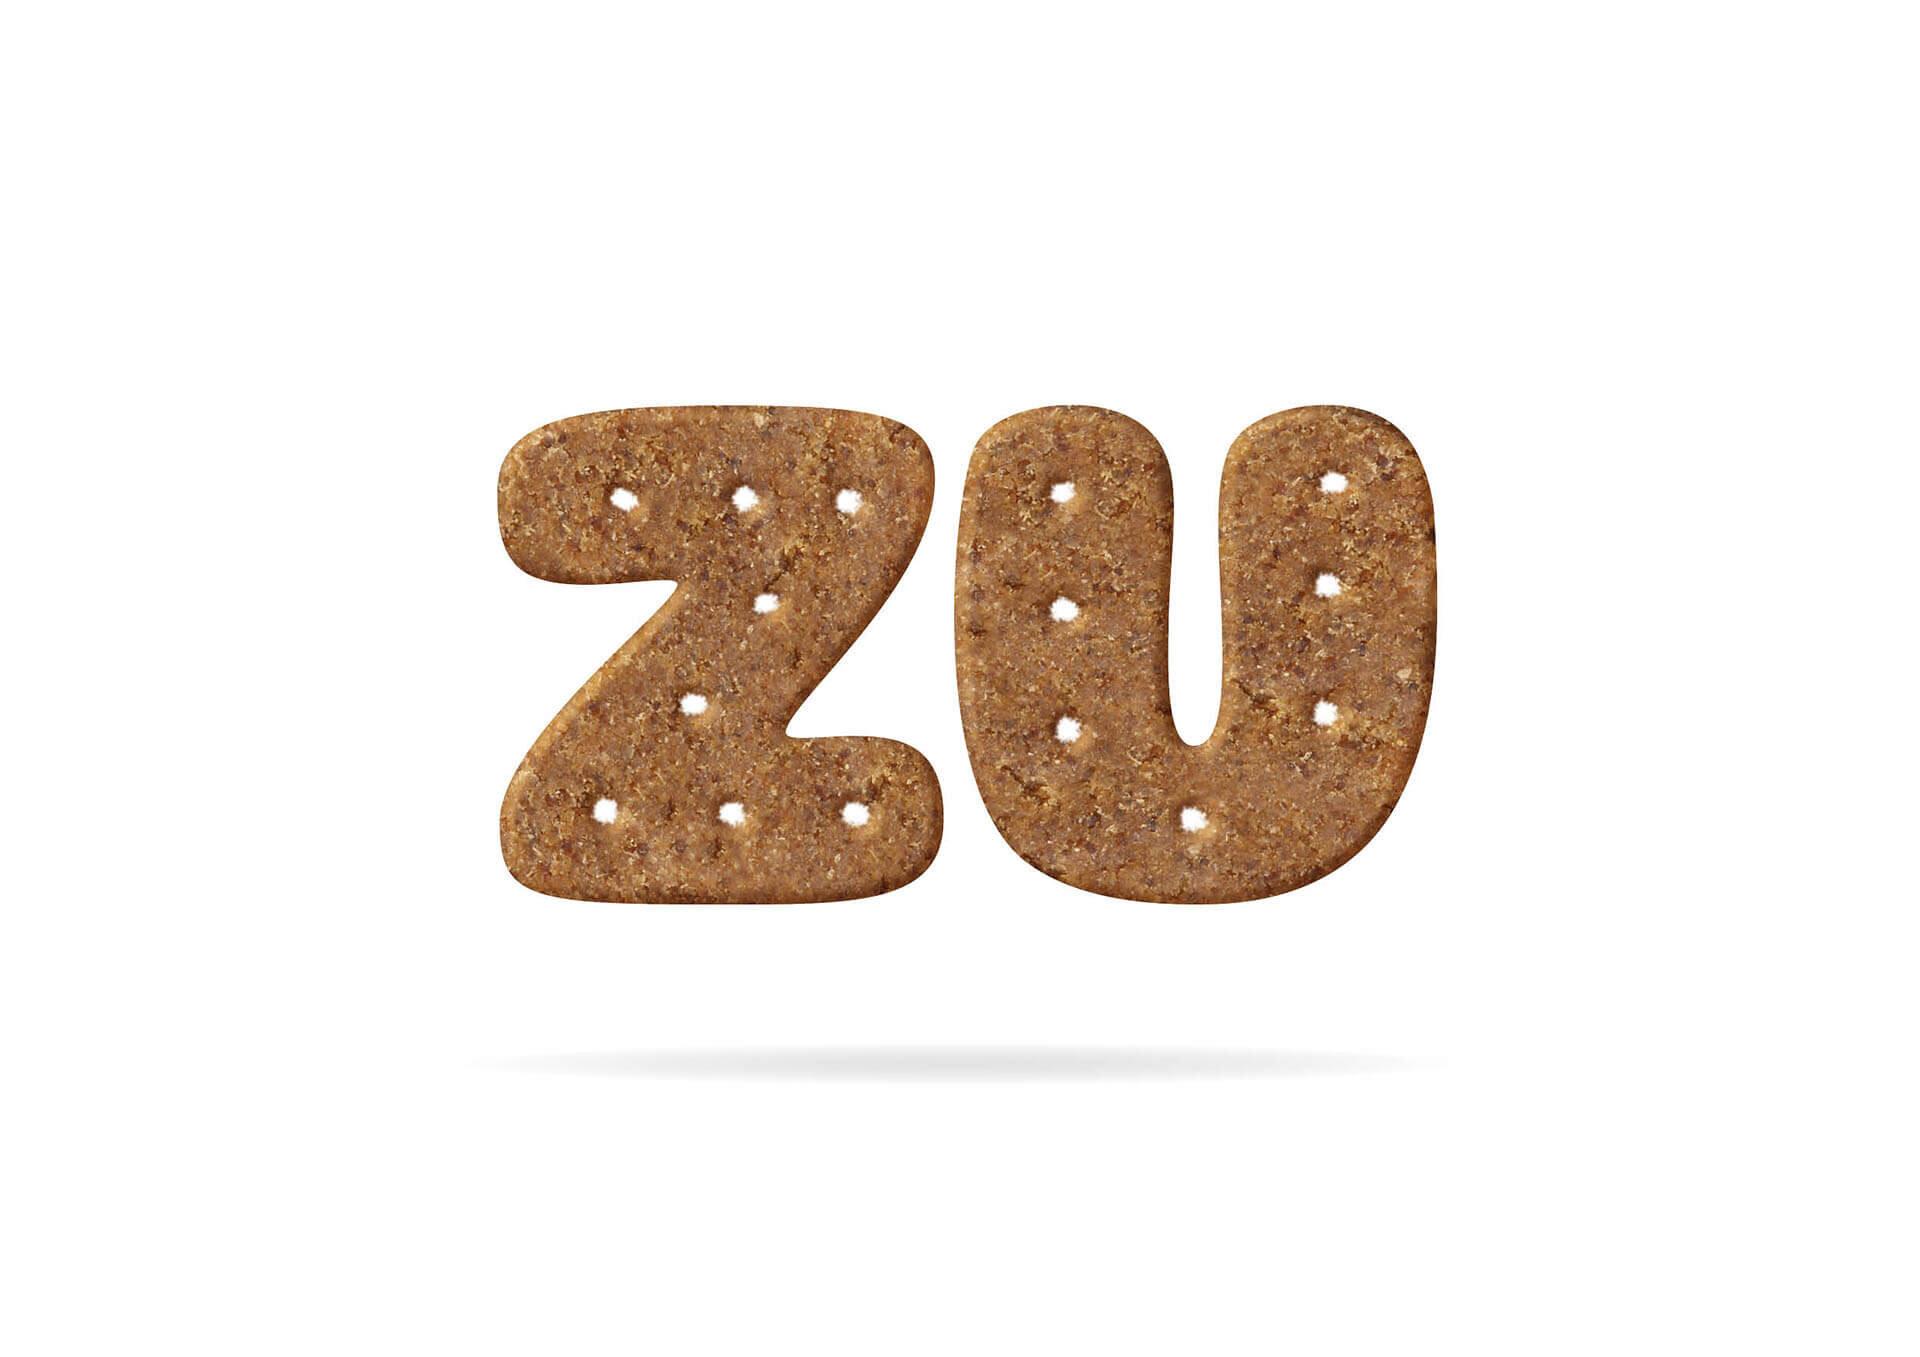 Zu logo sonae petcare logo cookie